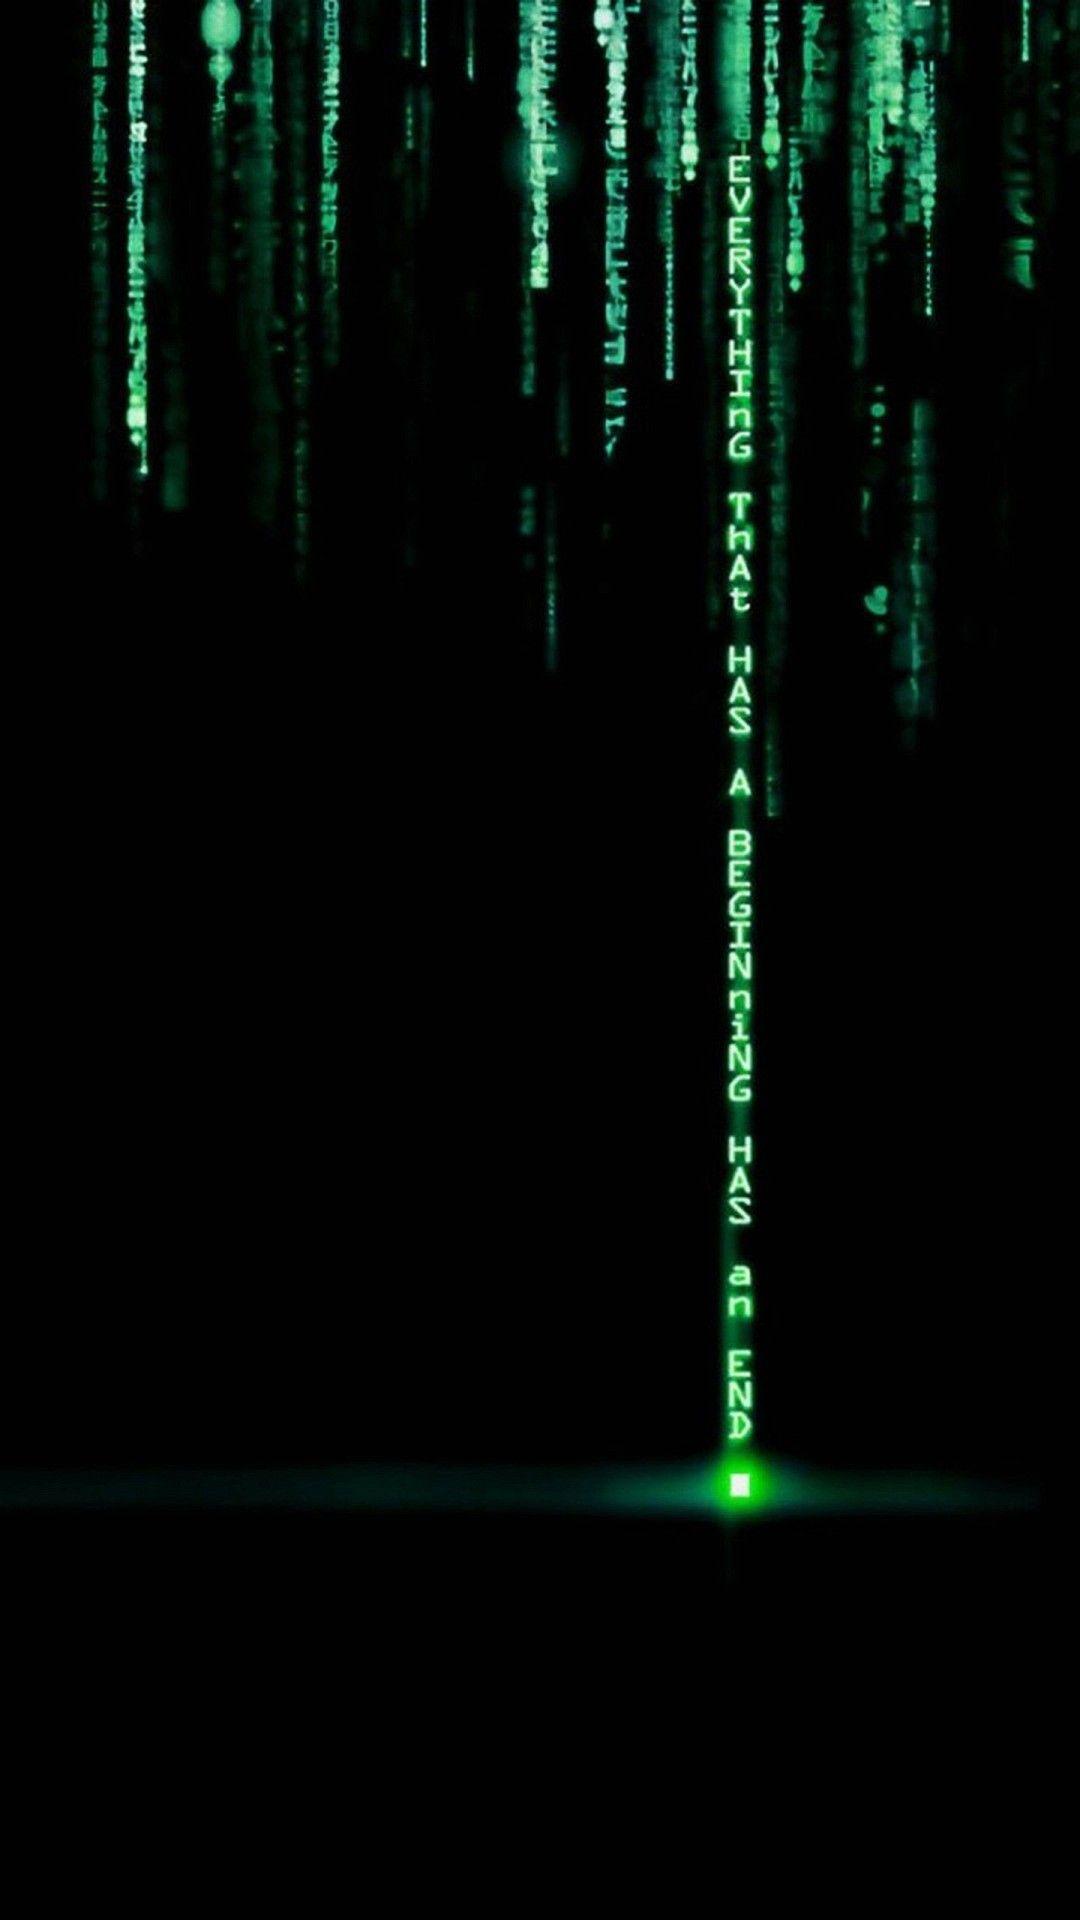 Pin By Douglas Macedo On Iphone Wallpaper The Matrix Movie Revolution Poster Matrix Reloaded